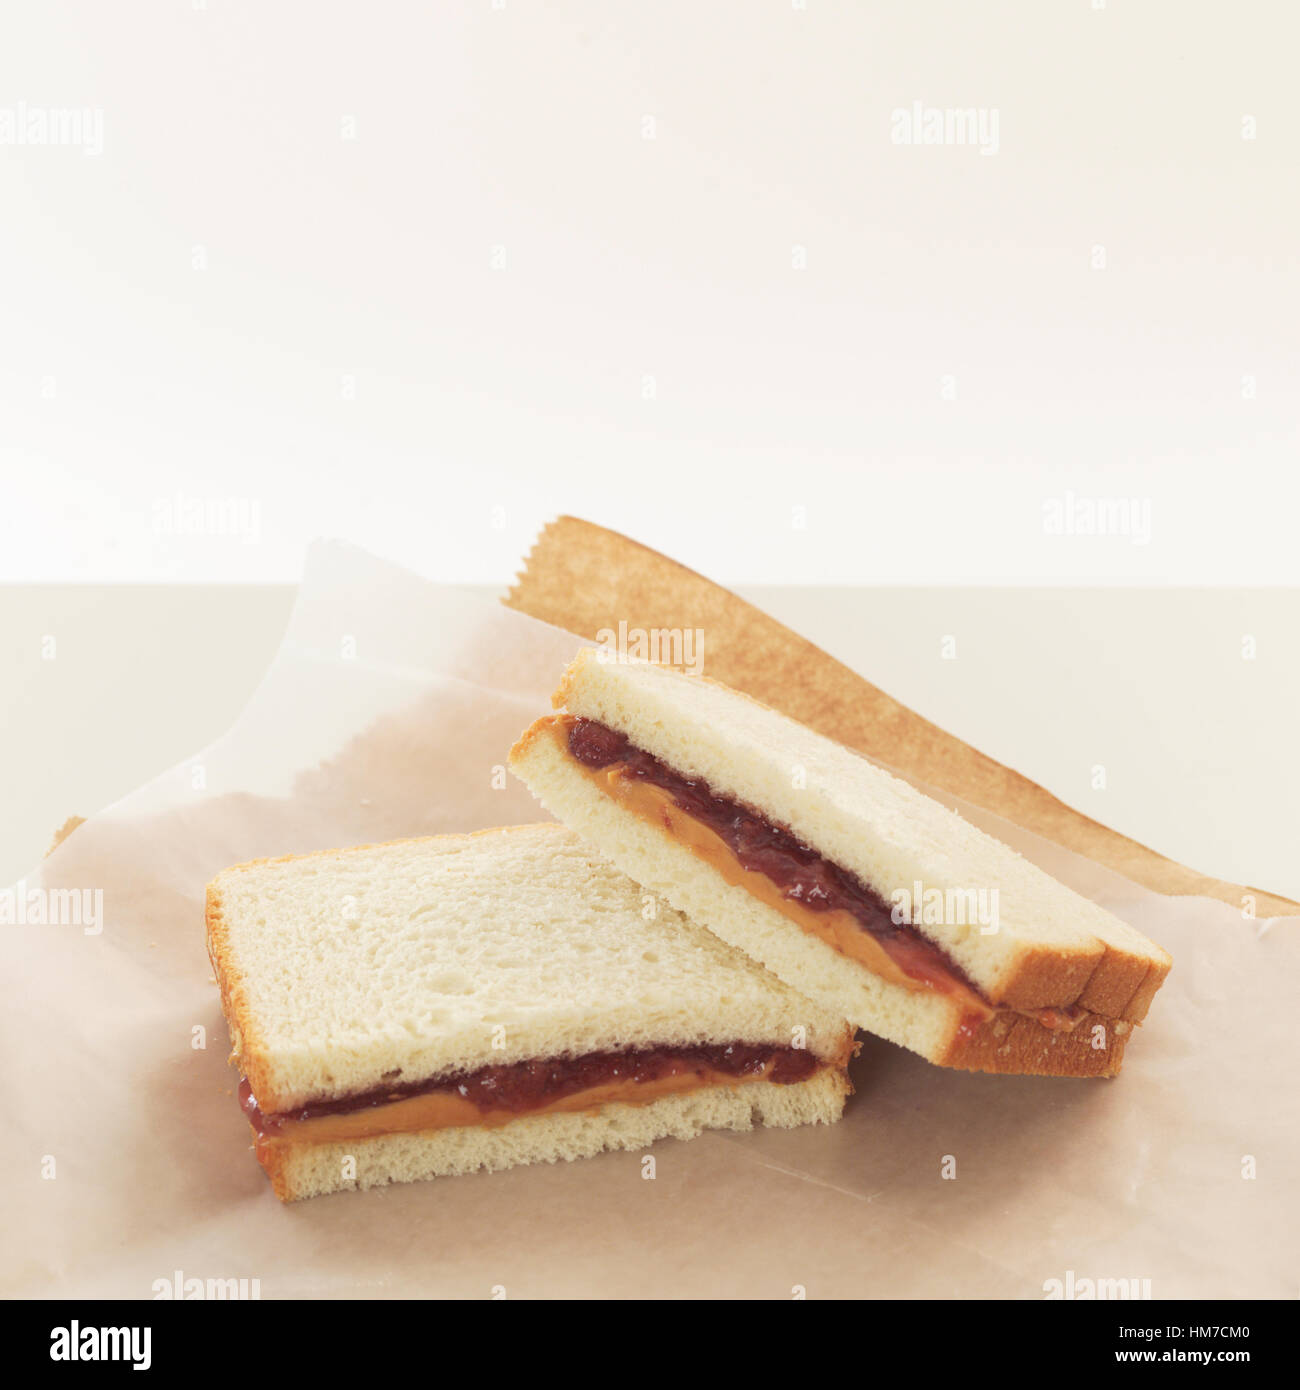 Peanut butter and jelly sandwiches sur du papier d'emballage Photo Stock